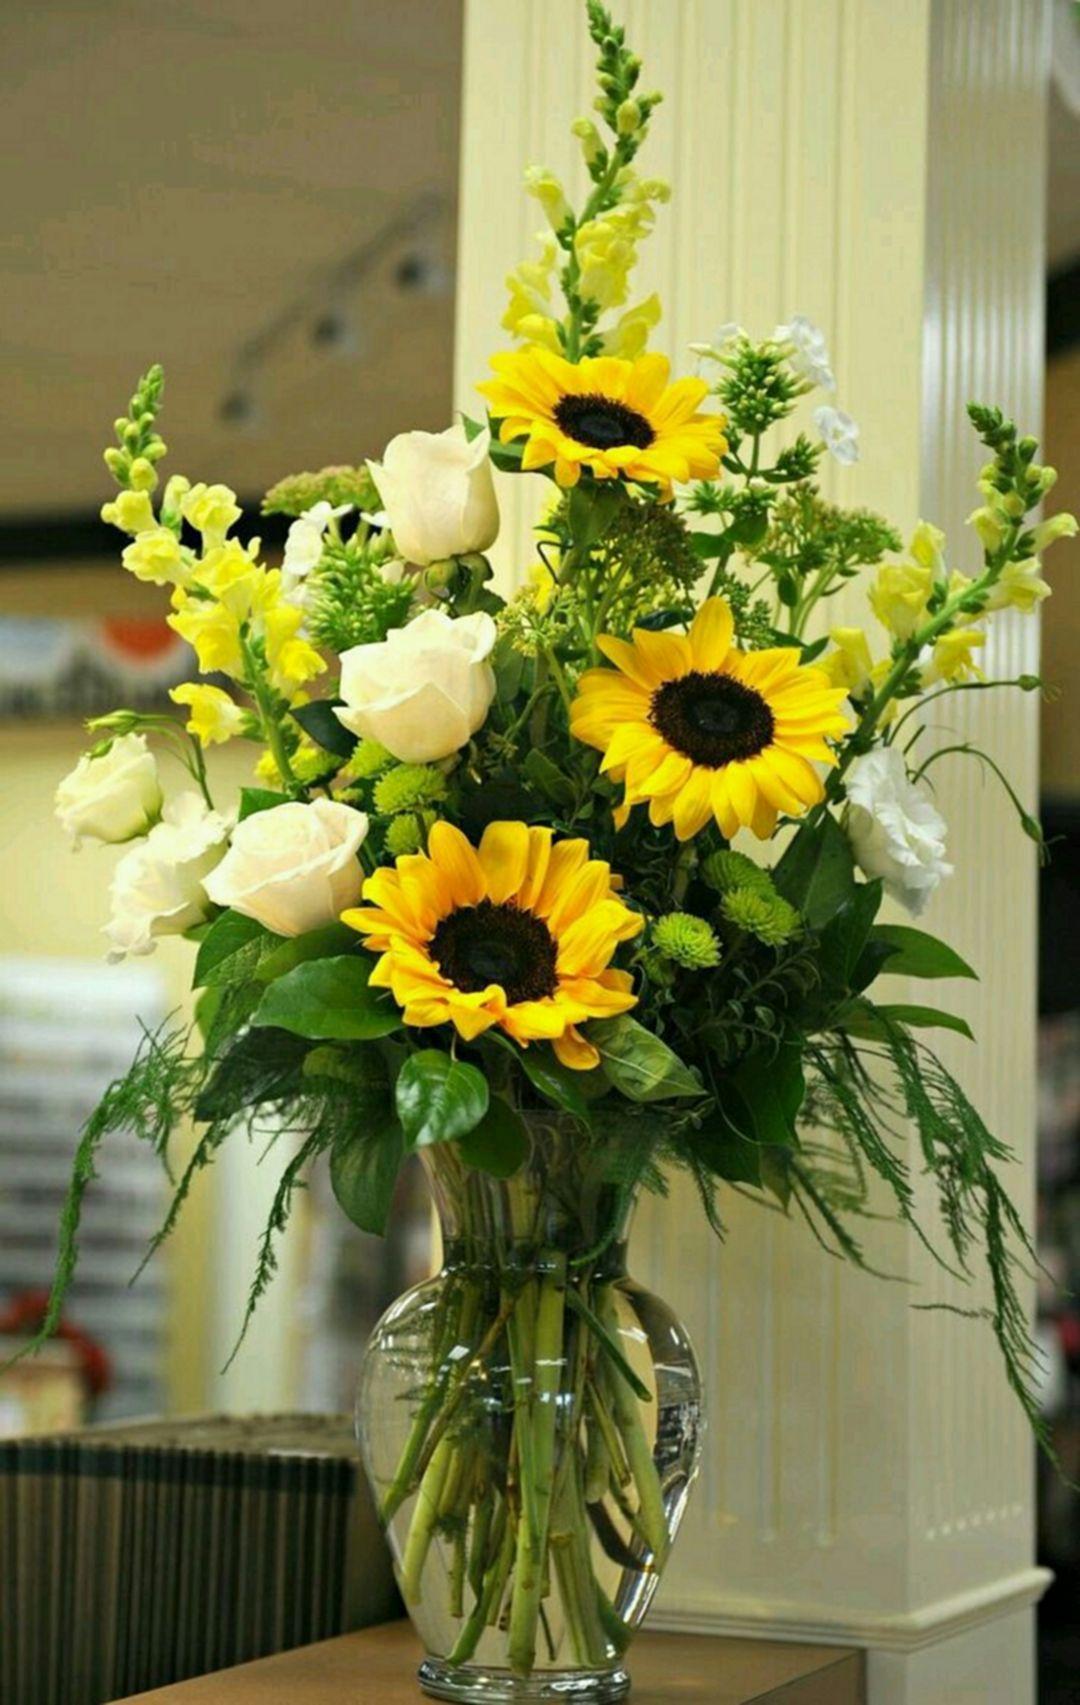 Phenomenon 60 Wonderful Rose Arrangement Ideas For Your Girlfriend Https Decoor Fresh Flowers Arrangements Flower Arrangements Simple Sunflower Arrangements